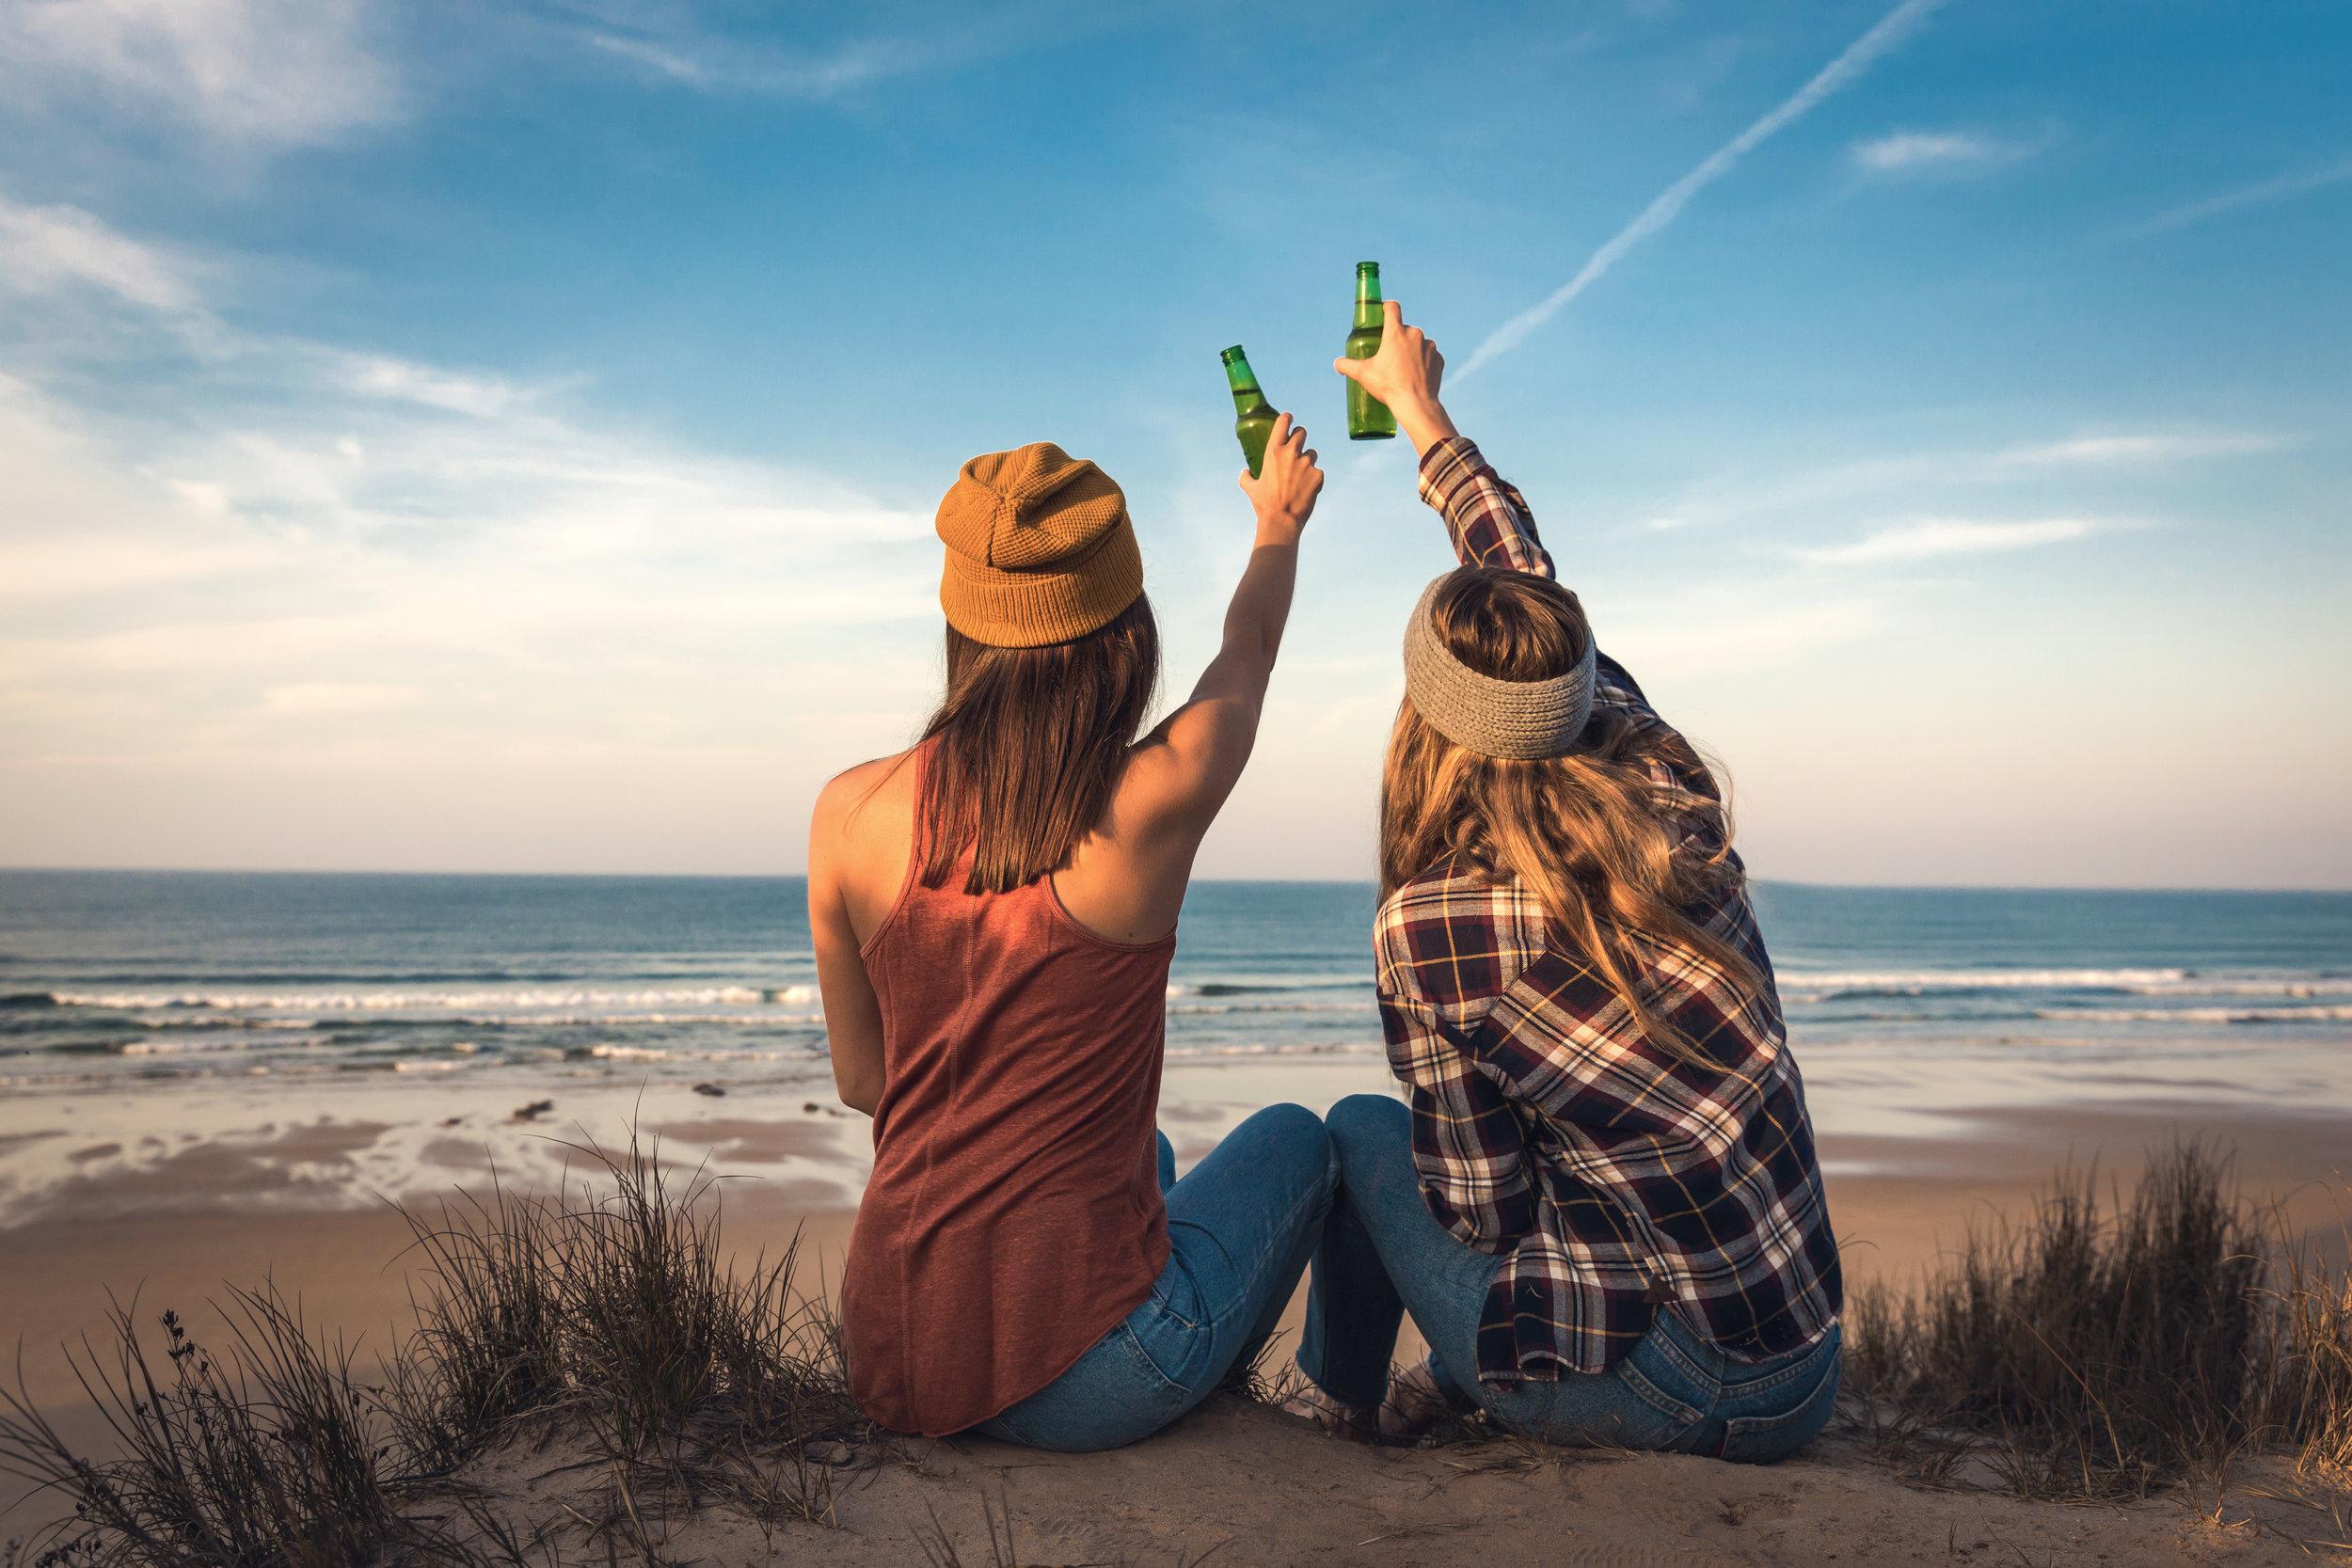 a-toast-to-friendship-UXSNP37.jpg